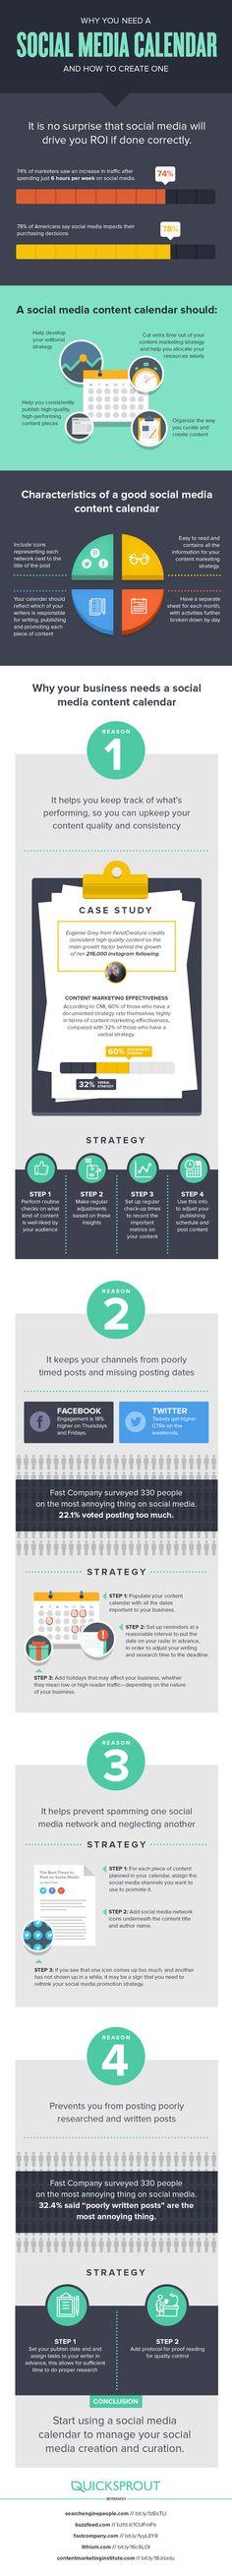 How to Create the Perfect Social Media Calendar